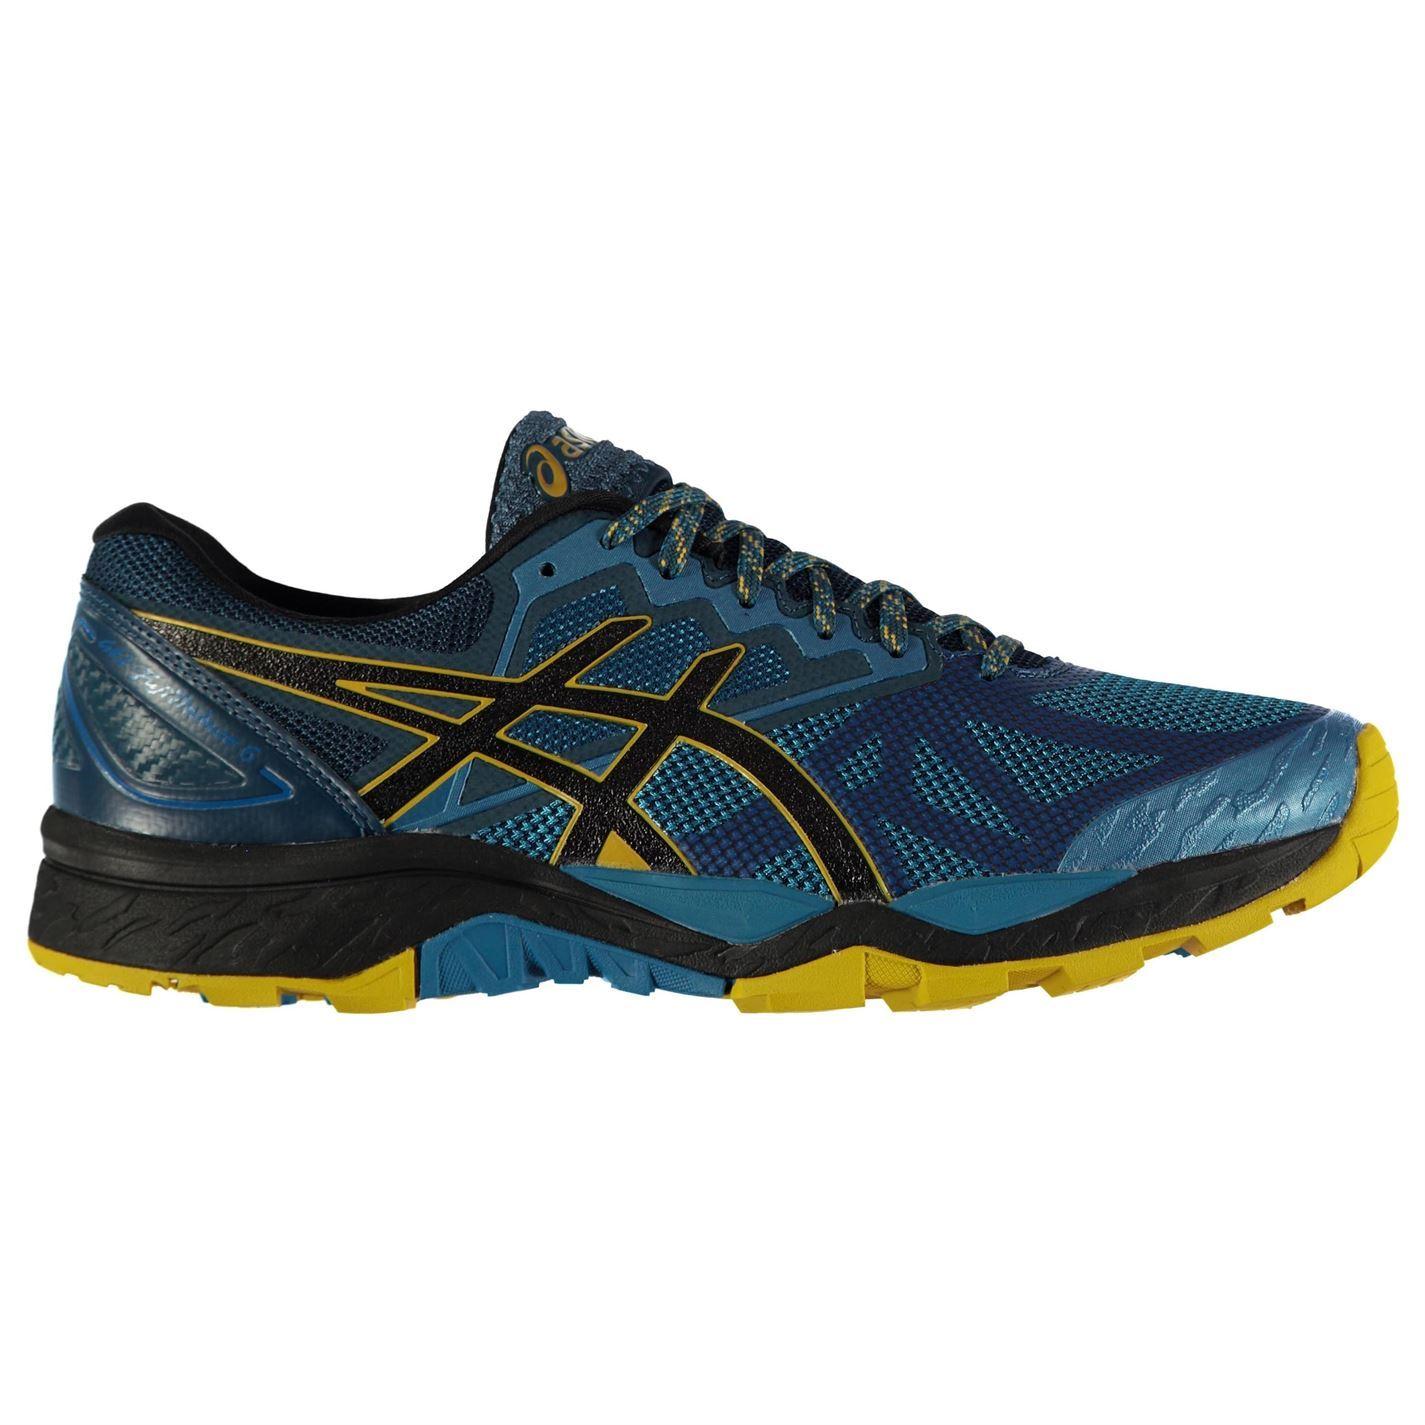 Asics Gel Fujitrabuco 6 Trail Running Schuhes  Herren Herren  Gents Laces Fastened Padded 79d894